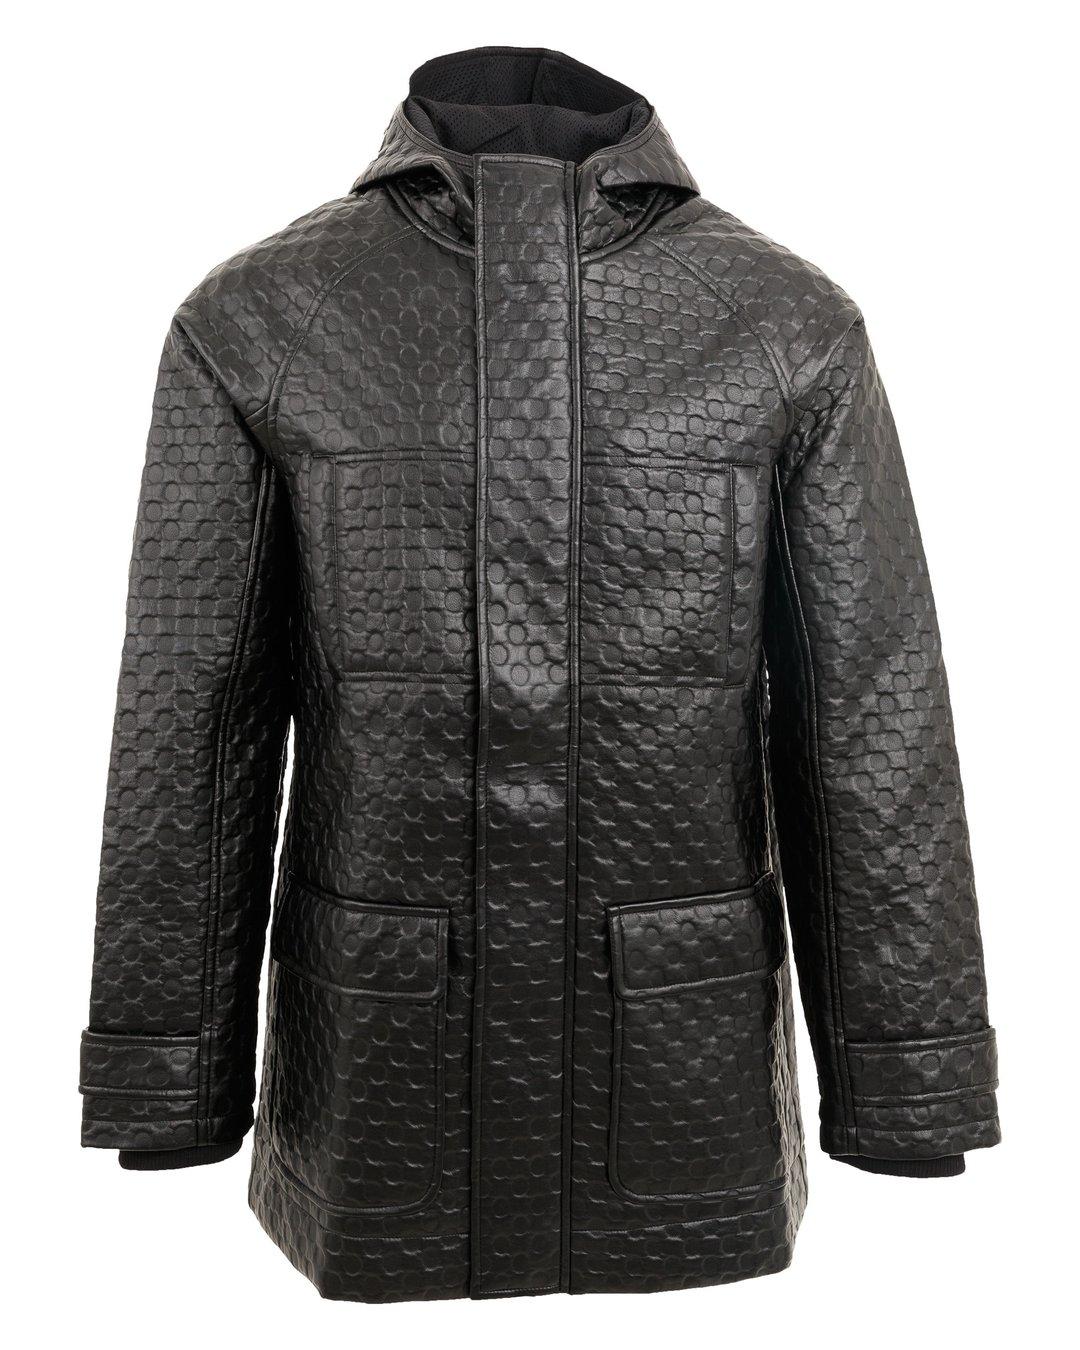 men-bartoe-bonded-coat-with-hood-1_1080x.jpg